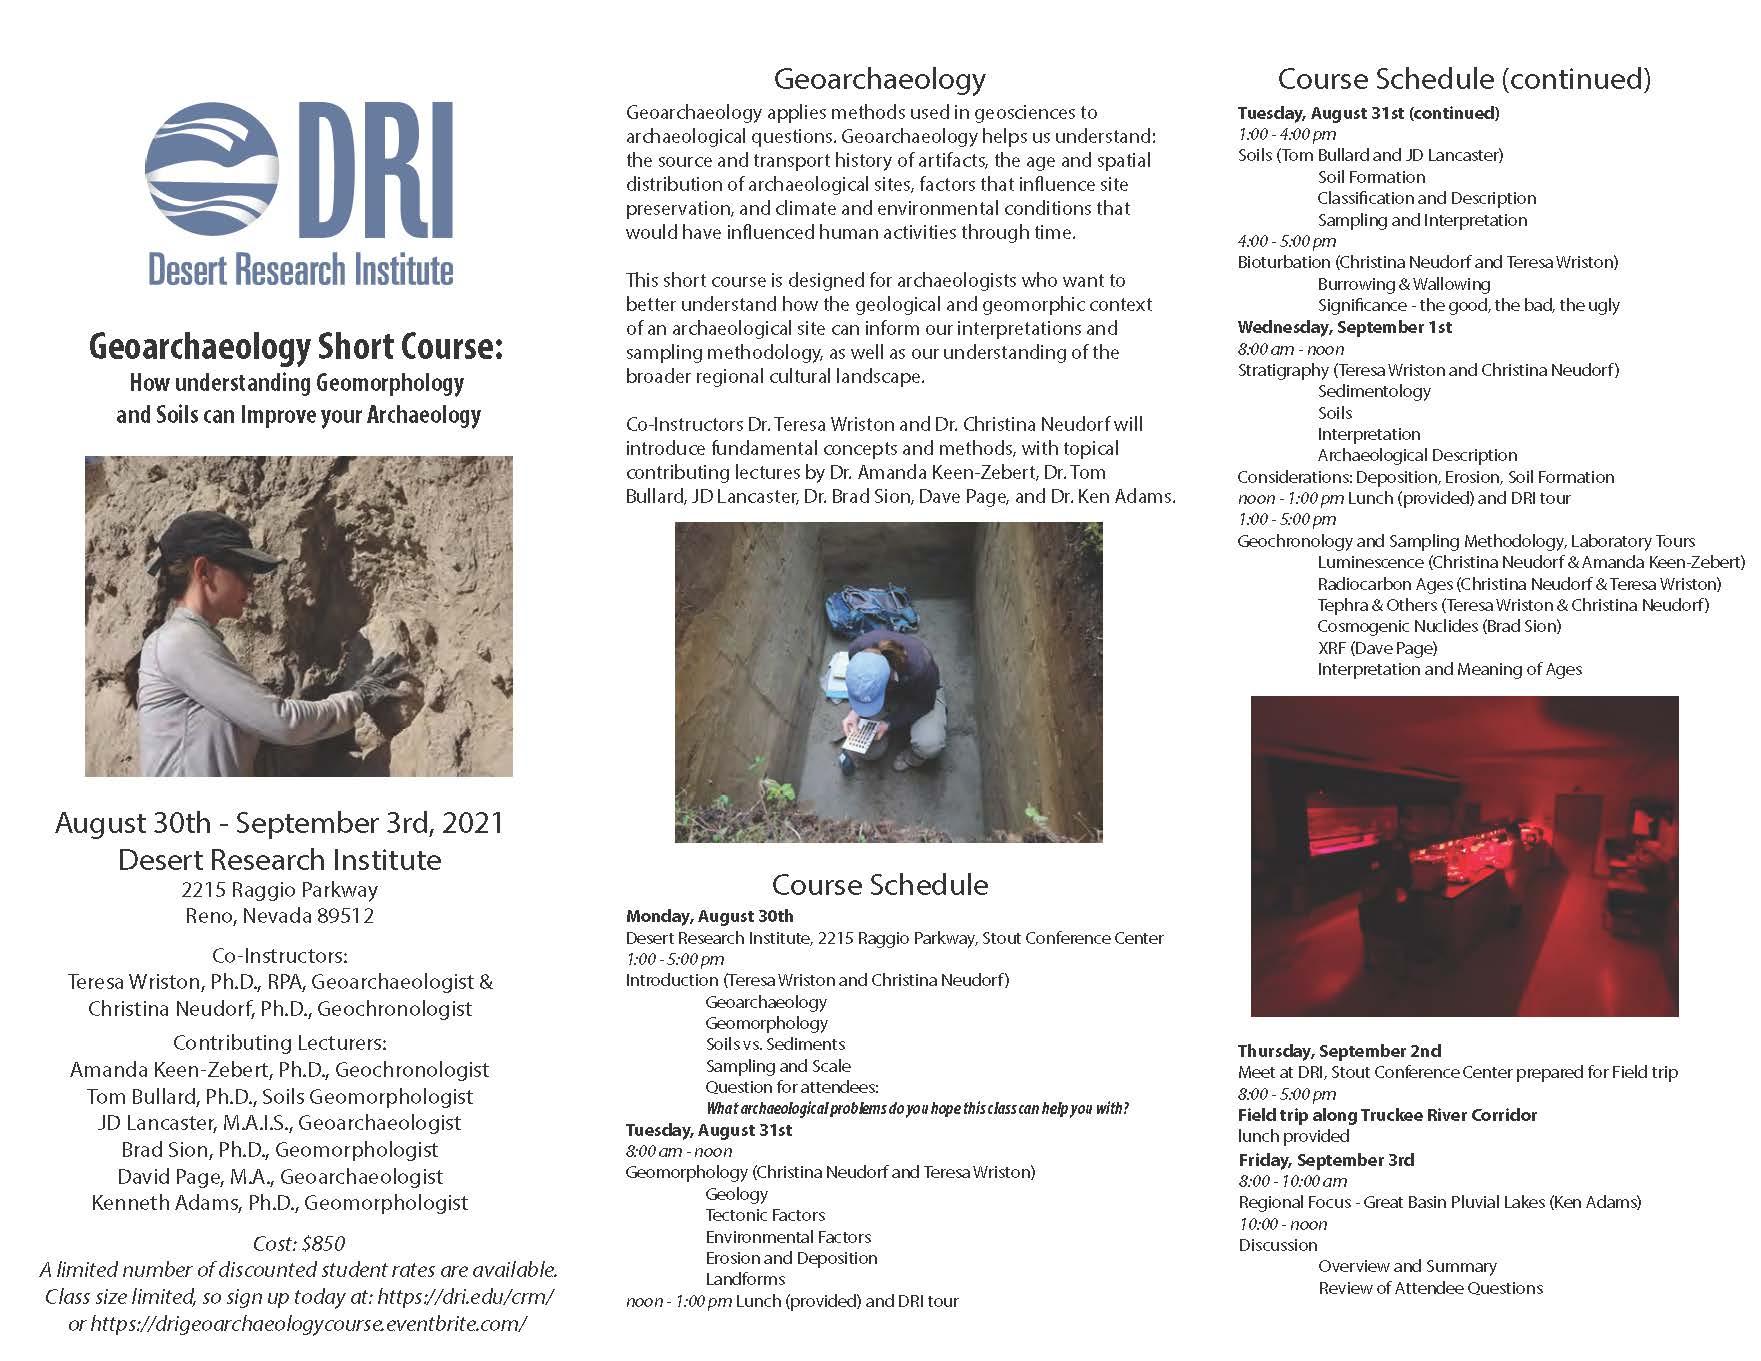 Flyer describing Geoarchaeology Short Course